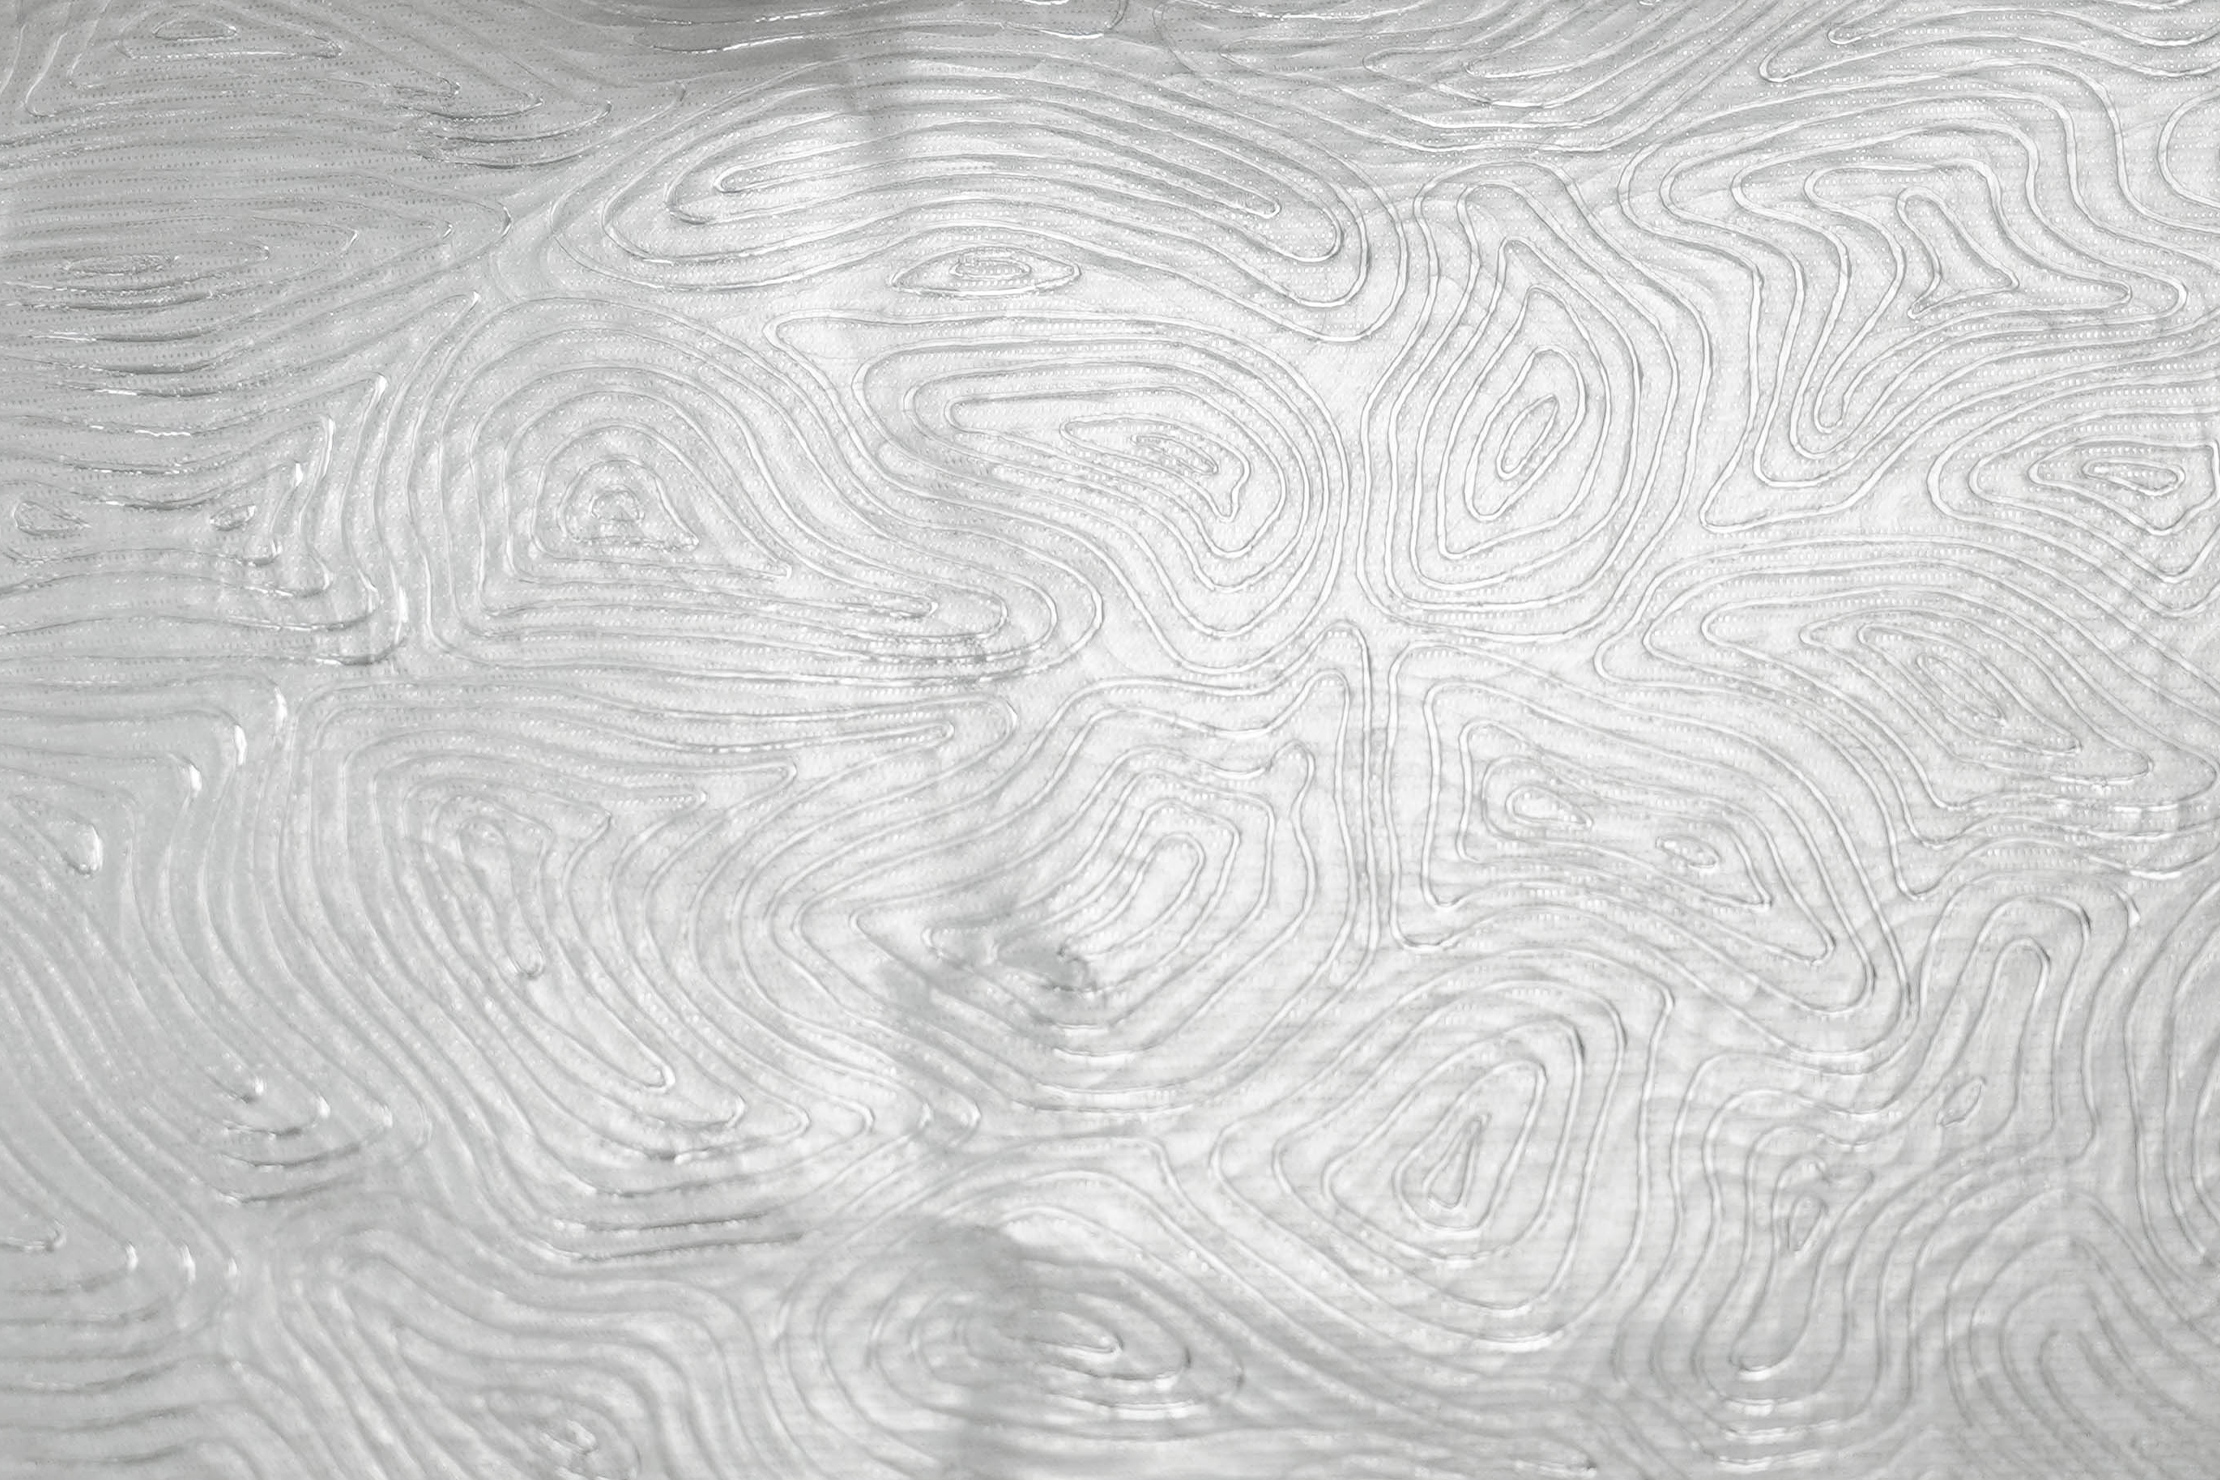 Nite Ize RunOff Waterproof Packing Cubes Texture